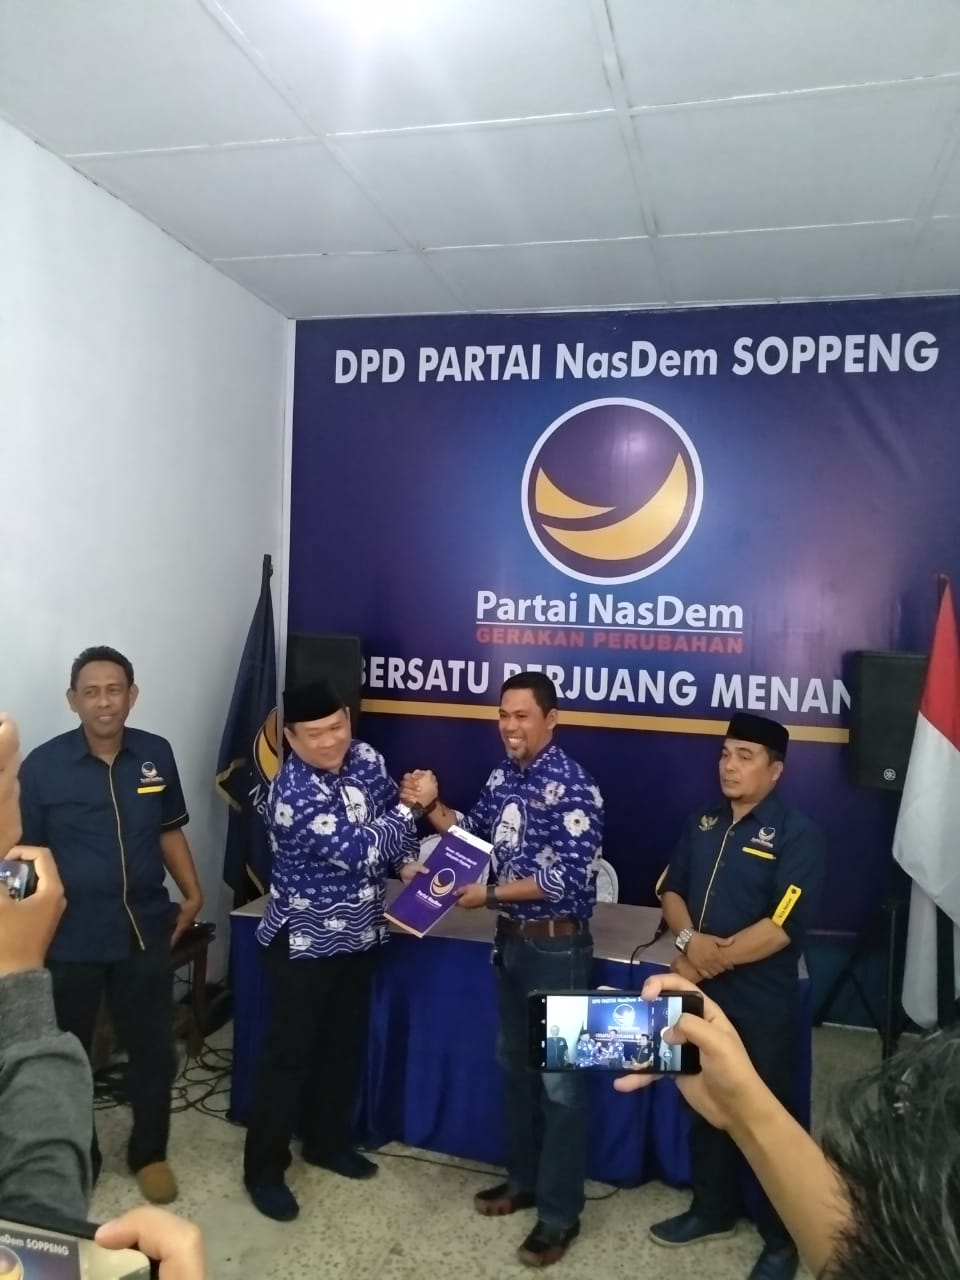 A Zulkarnaen Daftar Di Nasdem, 'Isyarat' LHD Batal Bertarung Di Pilkada Soppeng